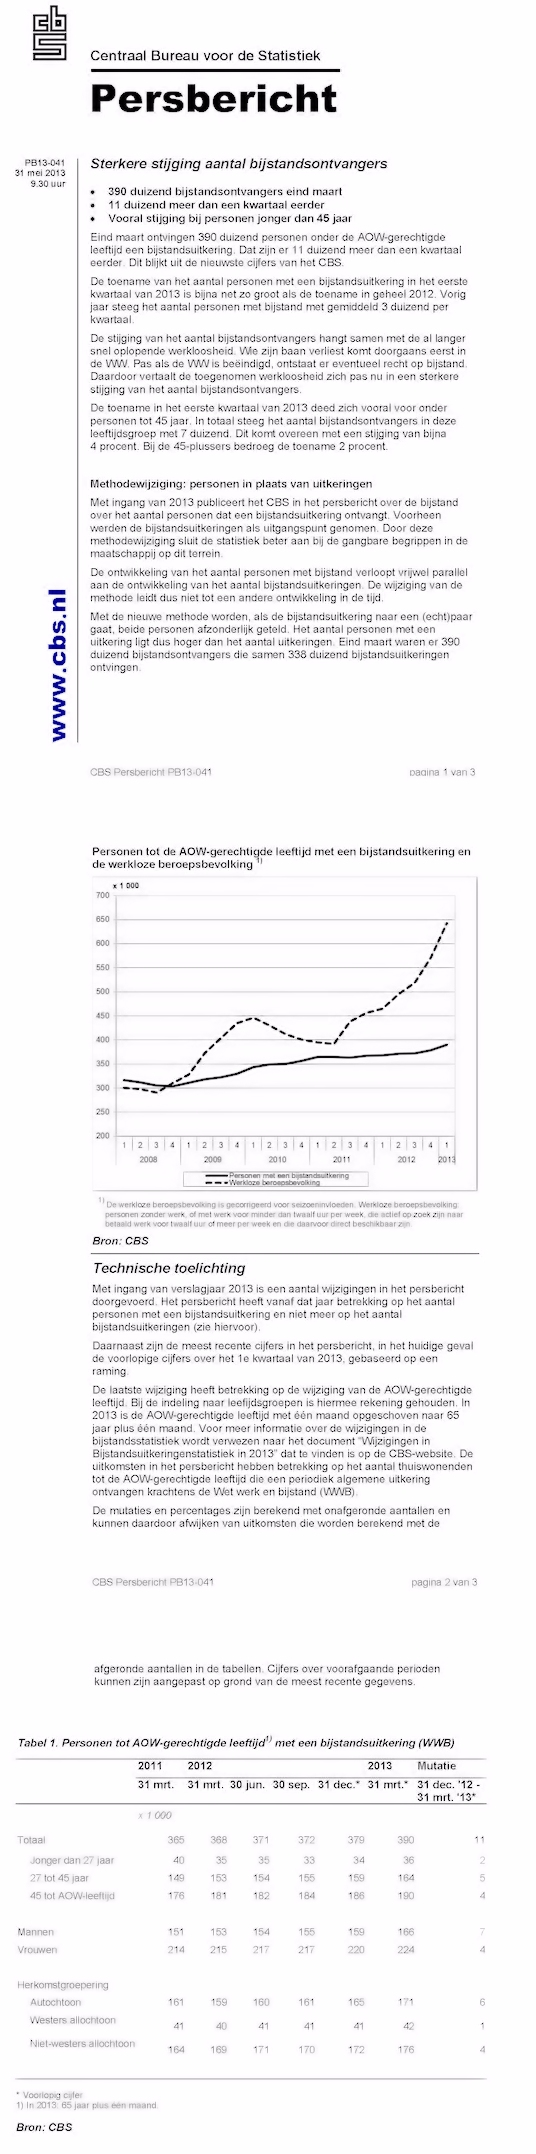 http://www.cbs.nl/nl-NL/menu/themas/arbeid-sociale-zekerheid/publicaties/artikelen/archief/2013/2013-041-pb.htm